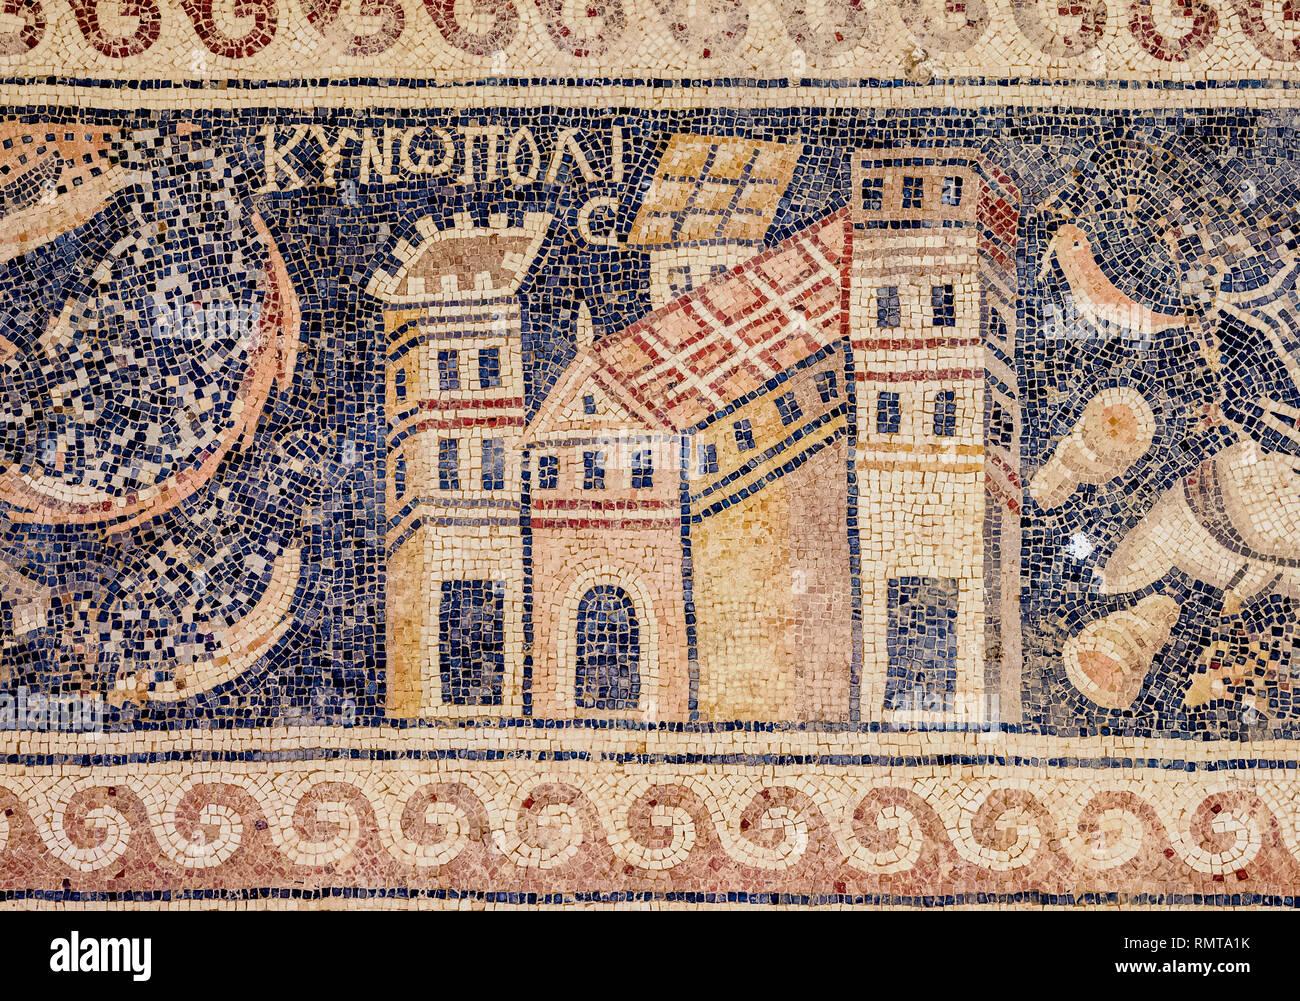 Mosaic Floor in Umm ar-Rasas, Amman Governorate, Jordan Stock Photo